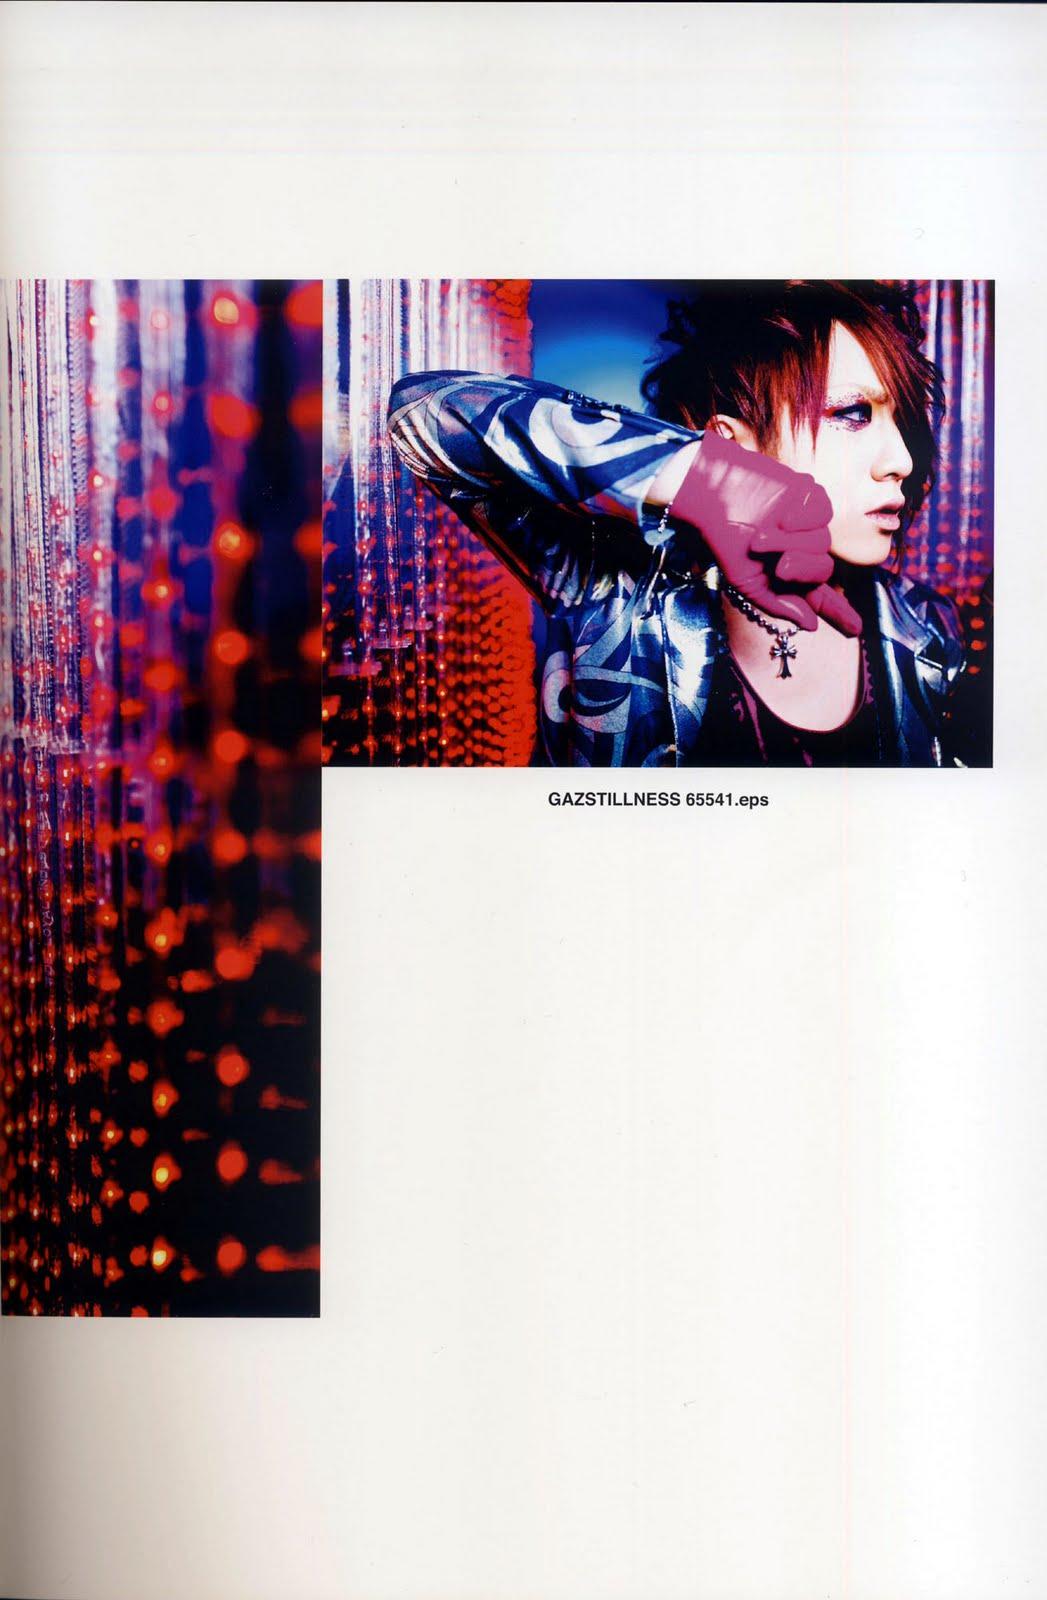 http://pics.livejournal.com/r_akira/pic/0000f3ck